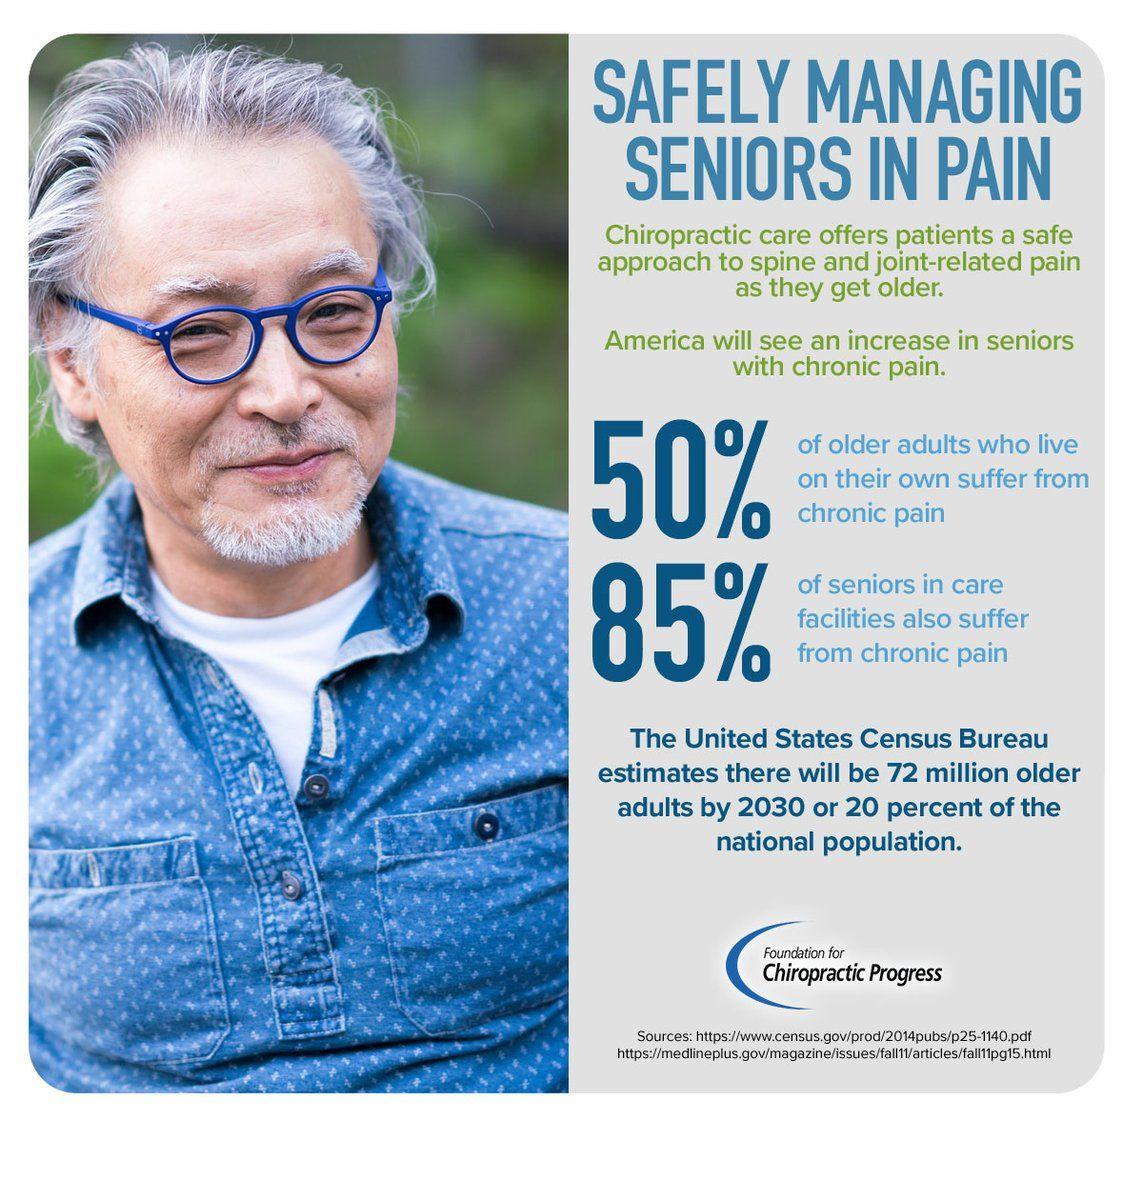 Chiropractic Care for Seniors Van Nuys Medicare Patients